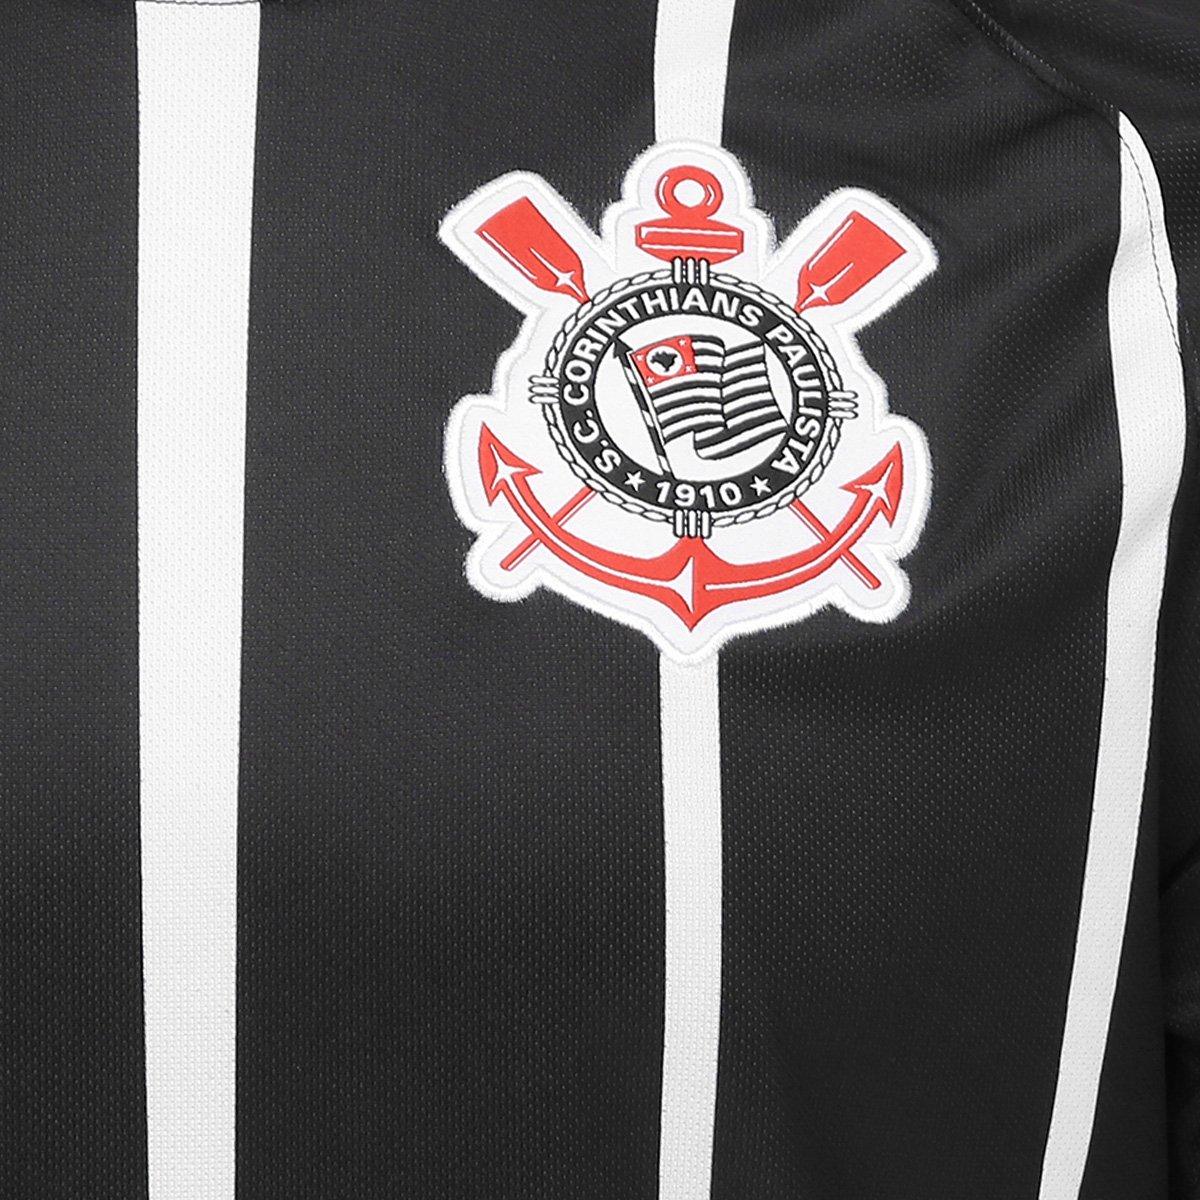 6a48fc8e97 Camisa Corinthians II 17 18 s nº Torcedor Nike Masculina - Compre ...